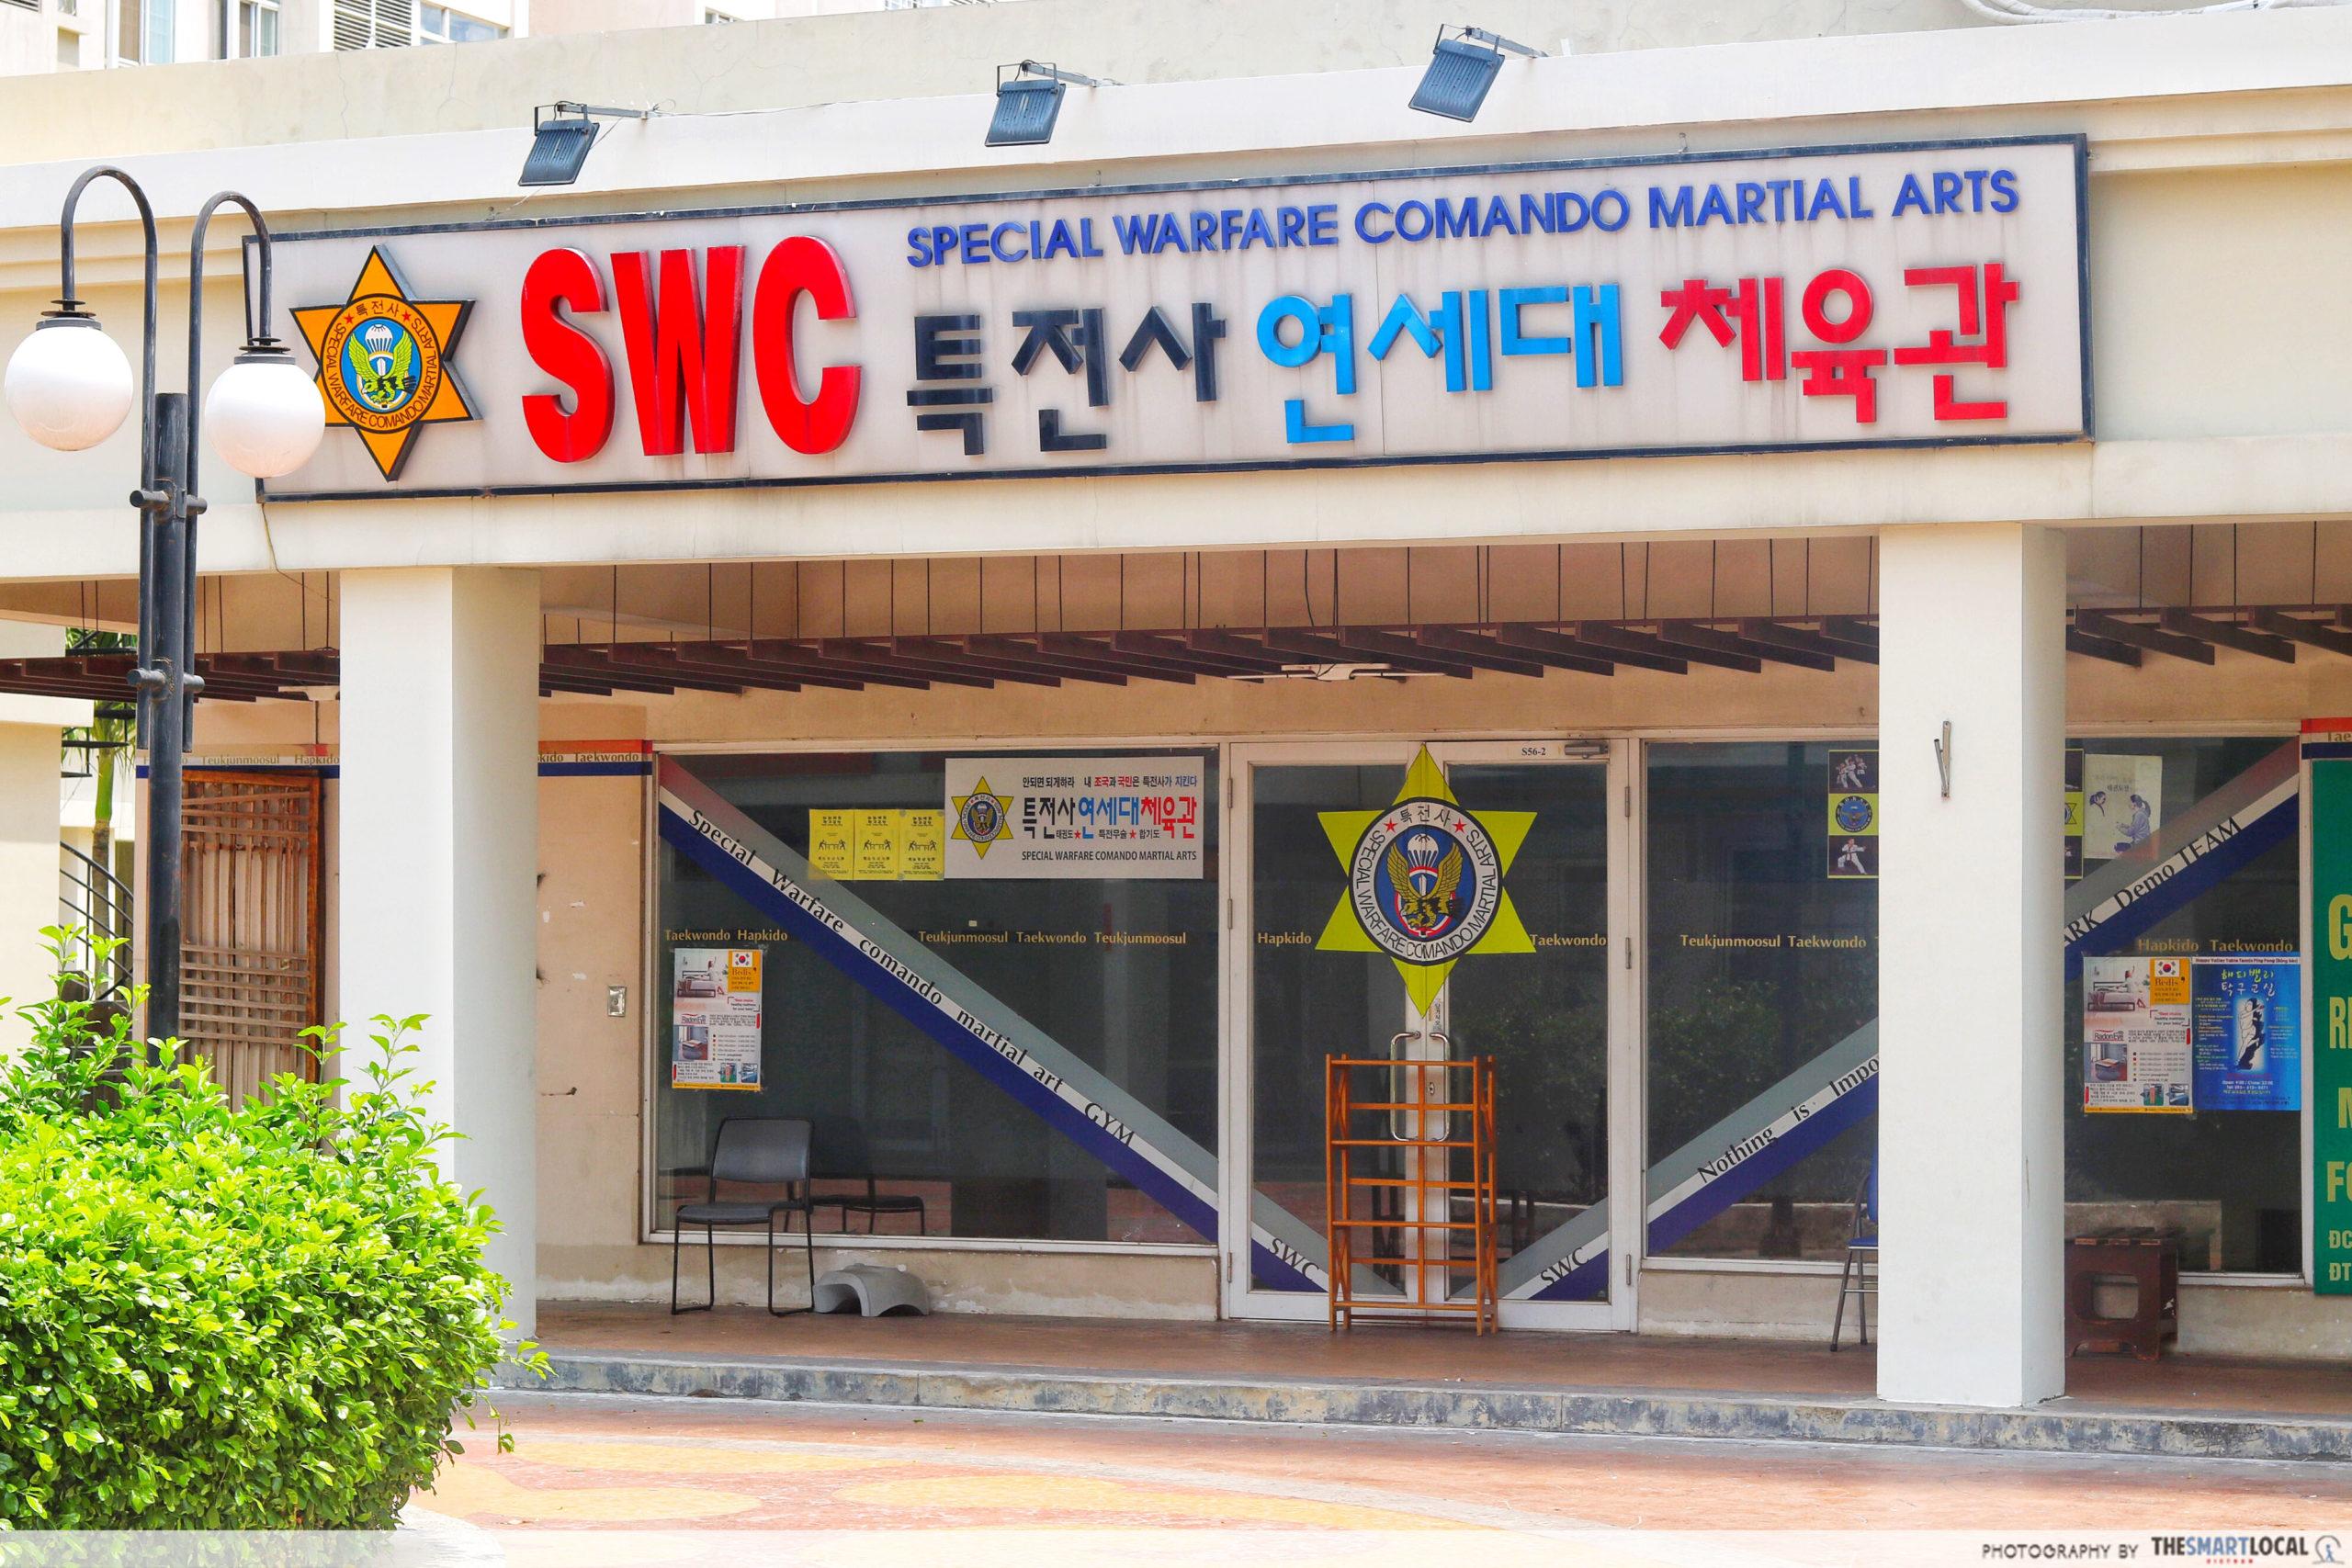 Martial art club in Sky Garden 3 shut down